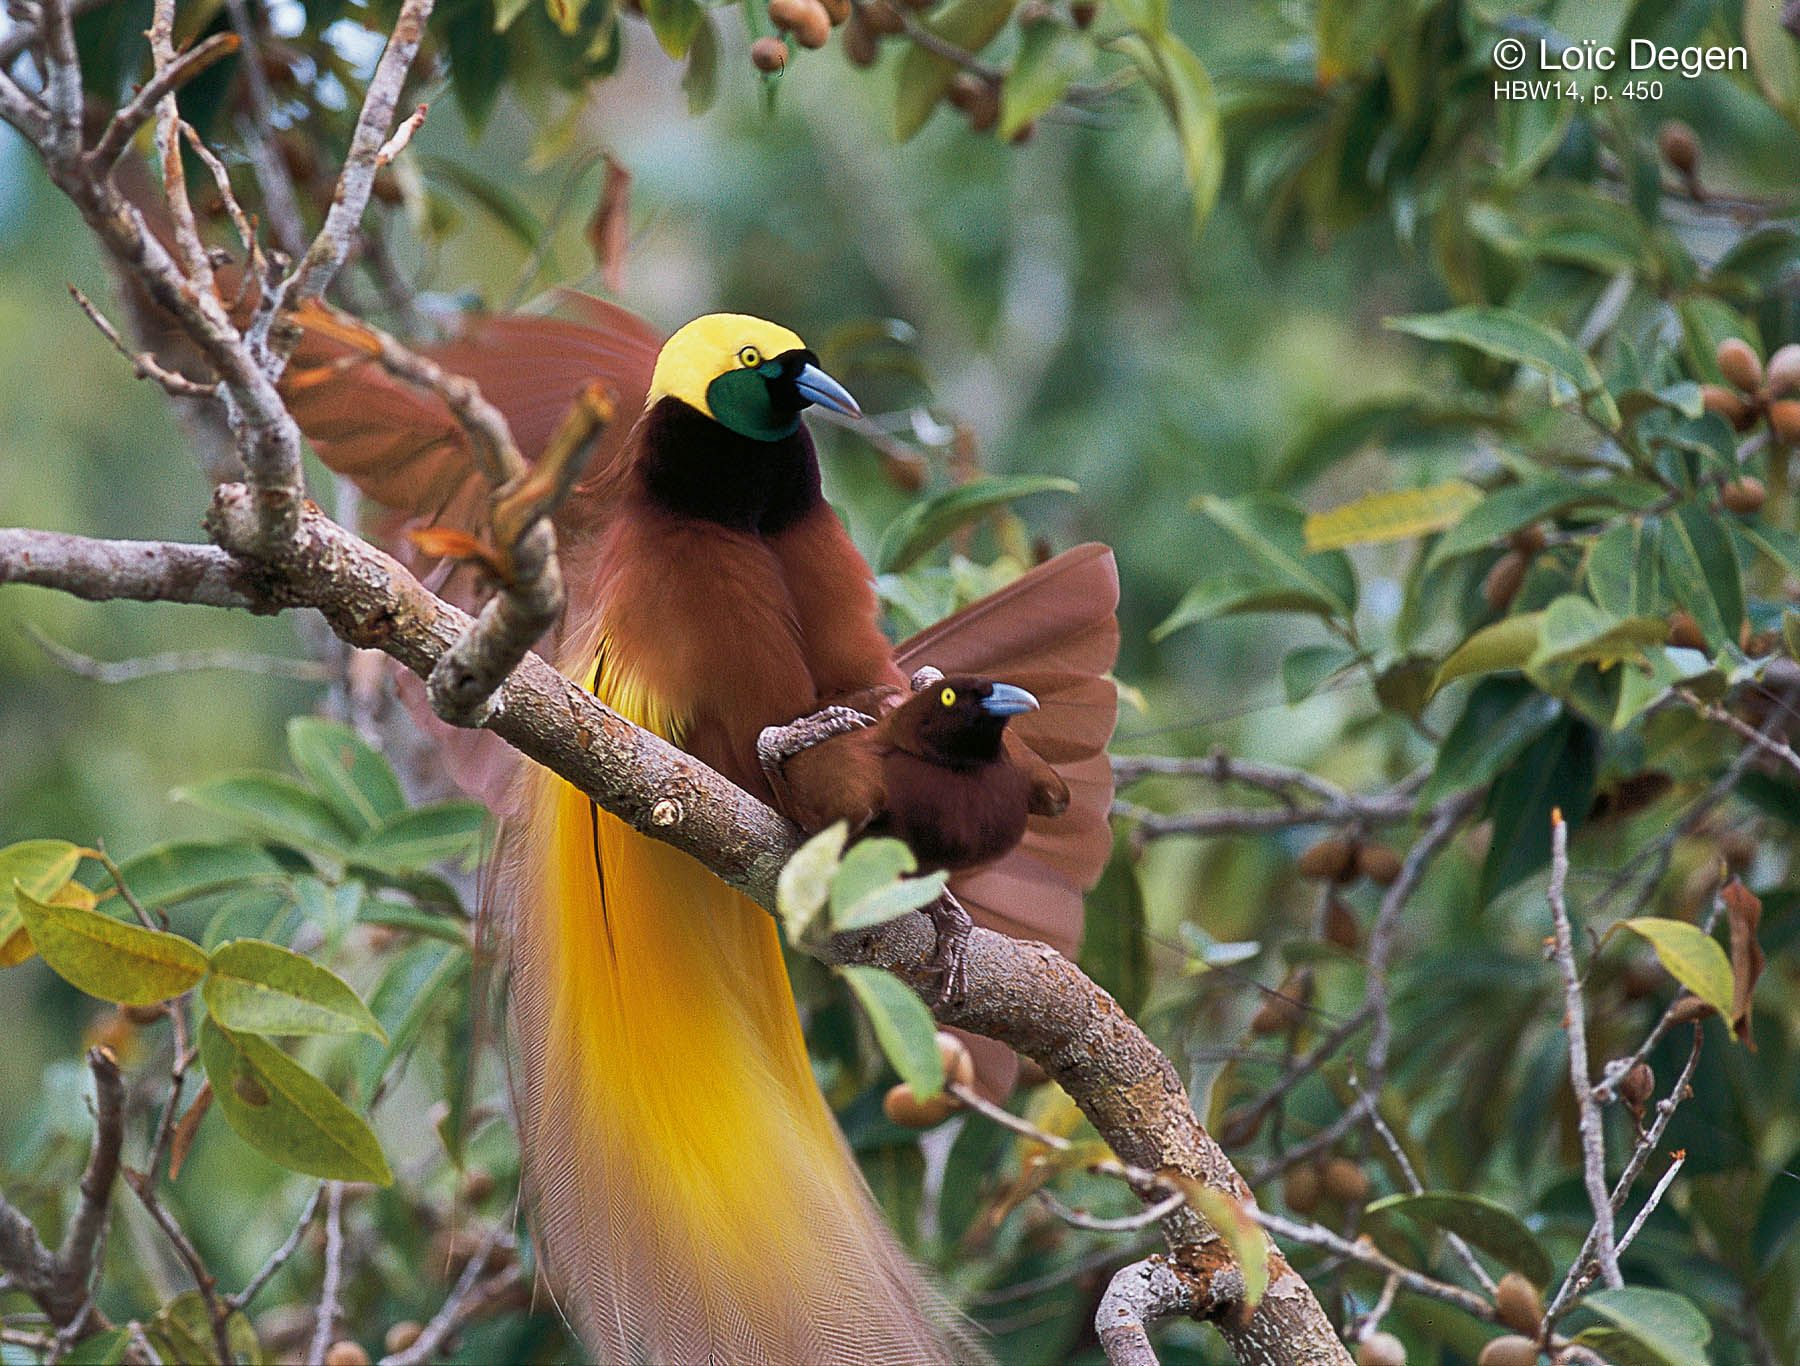 Greater Birdofparadise (Paradisaea apoda) A pair mating